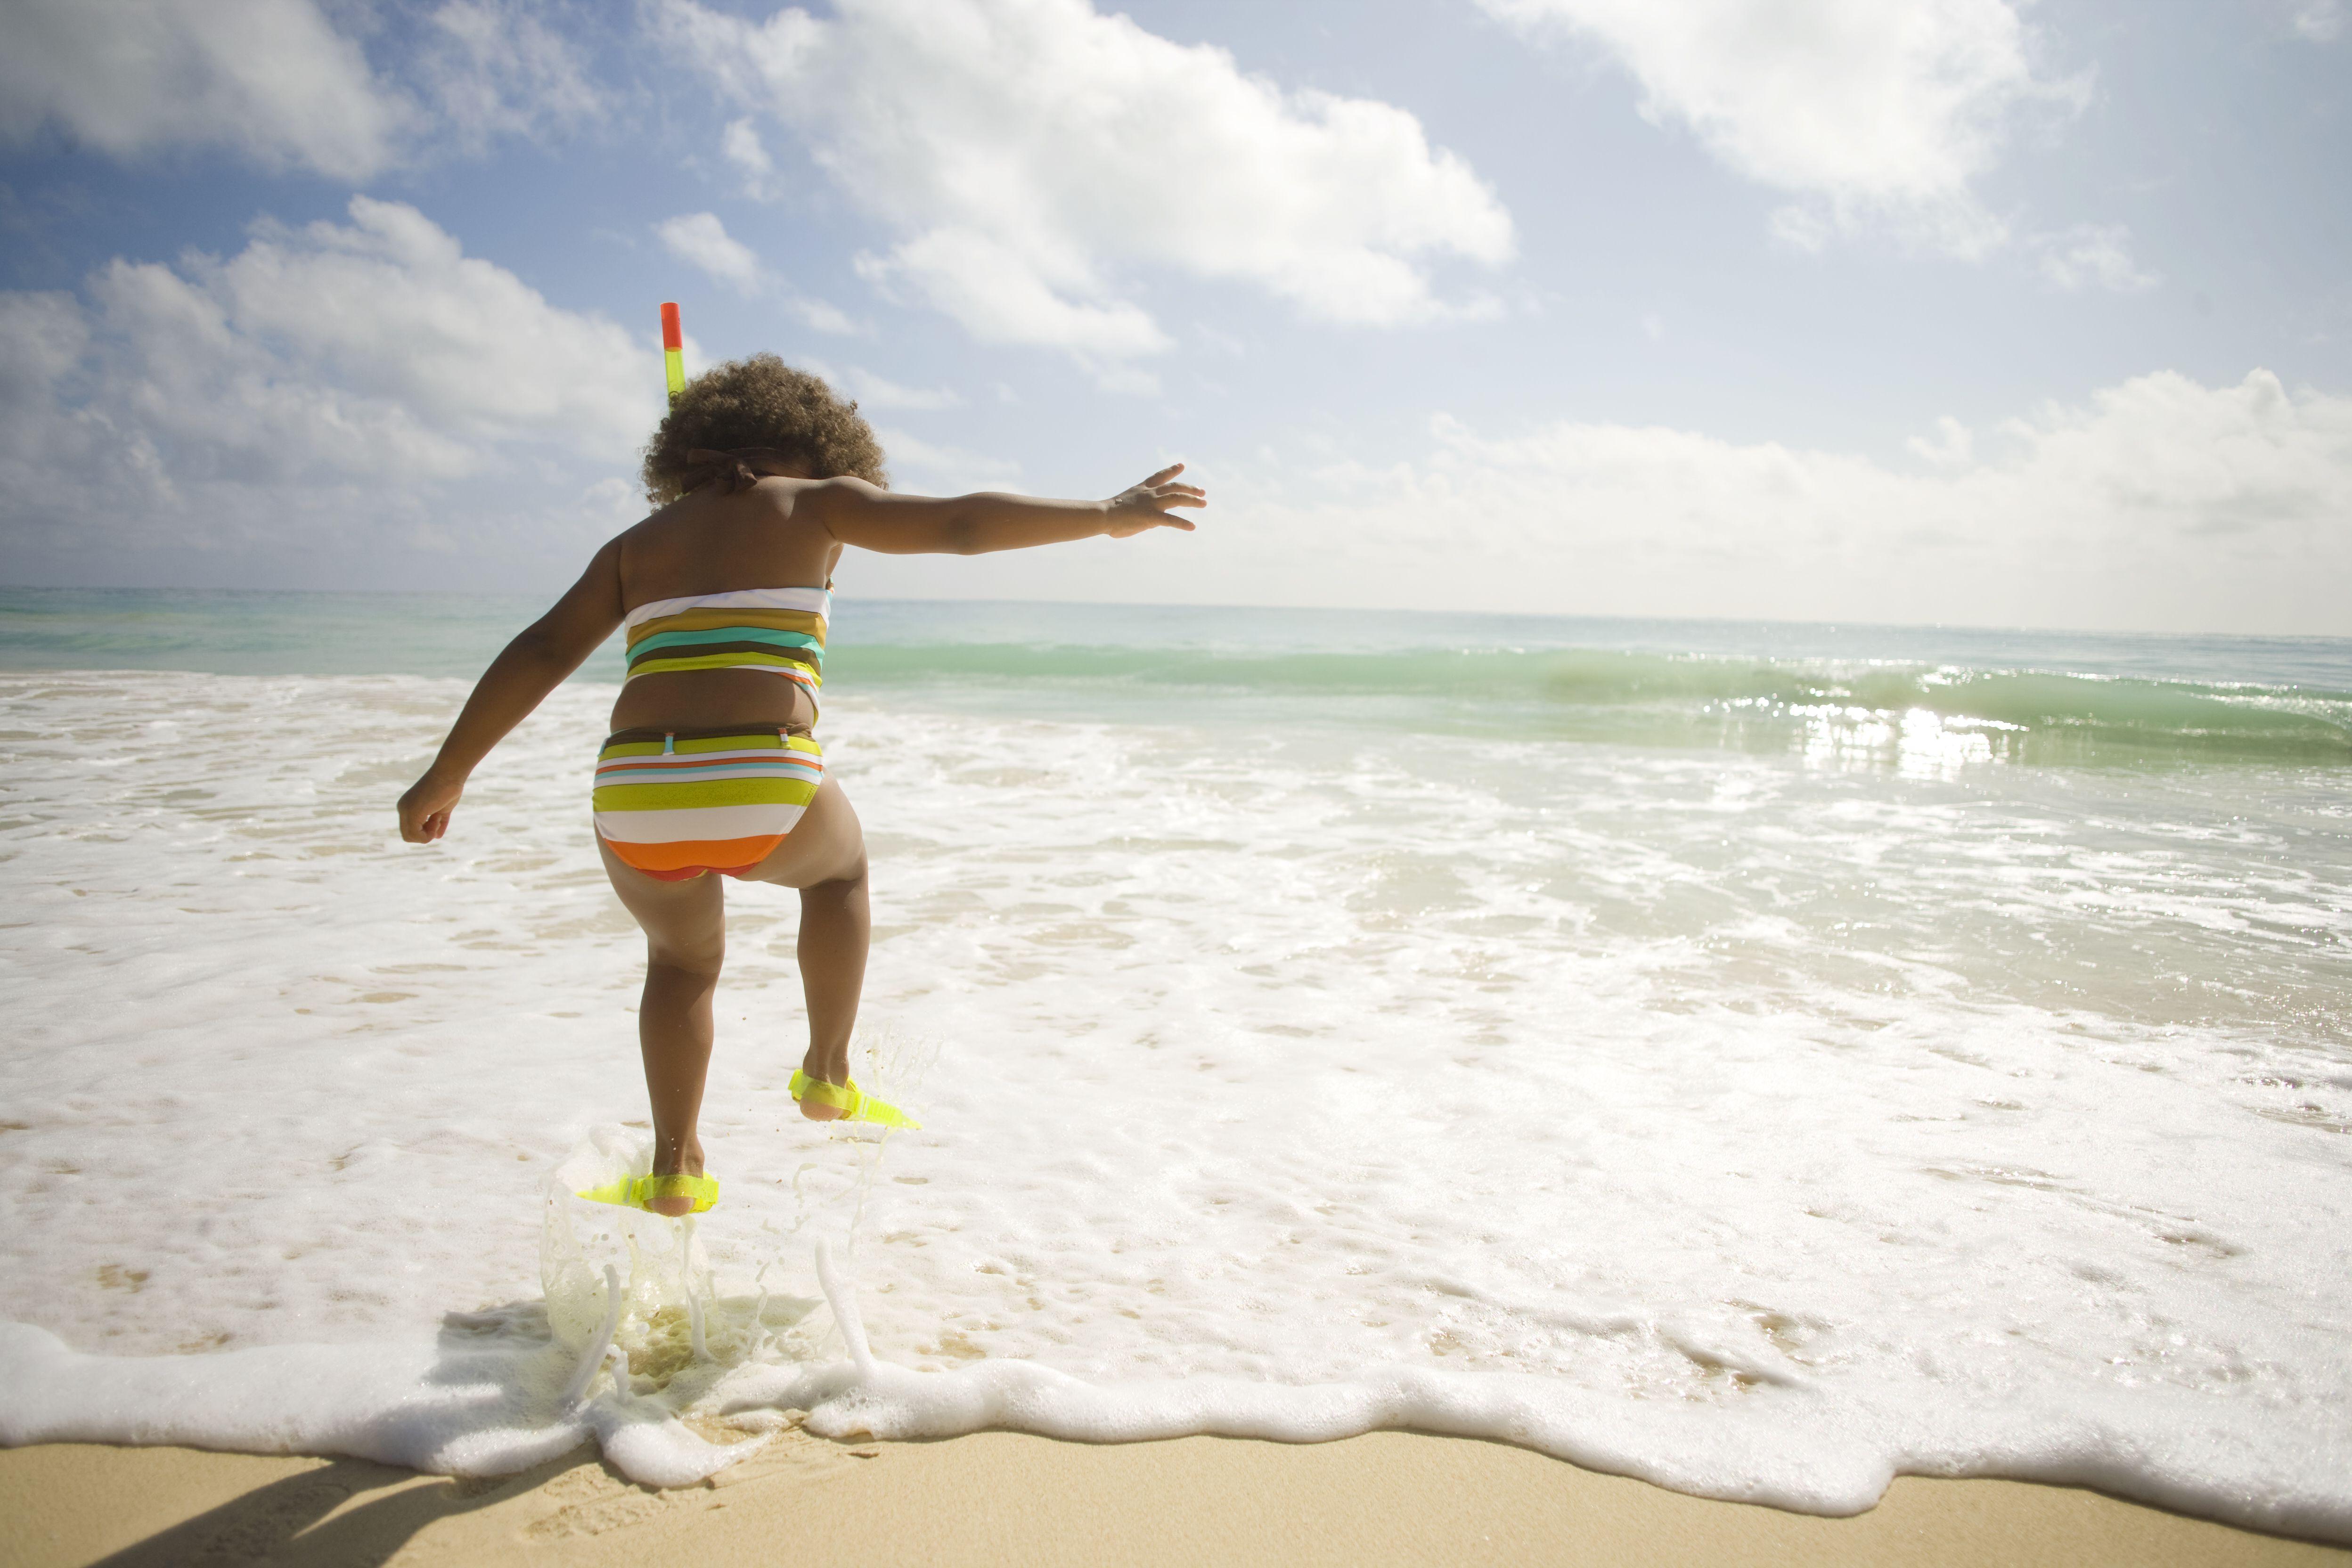 little girl with snorkel gear